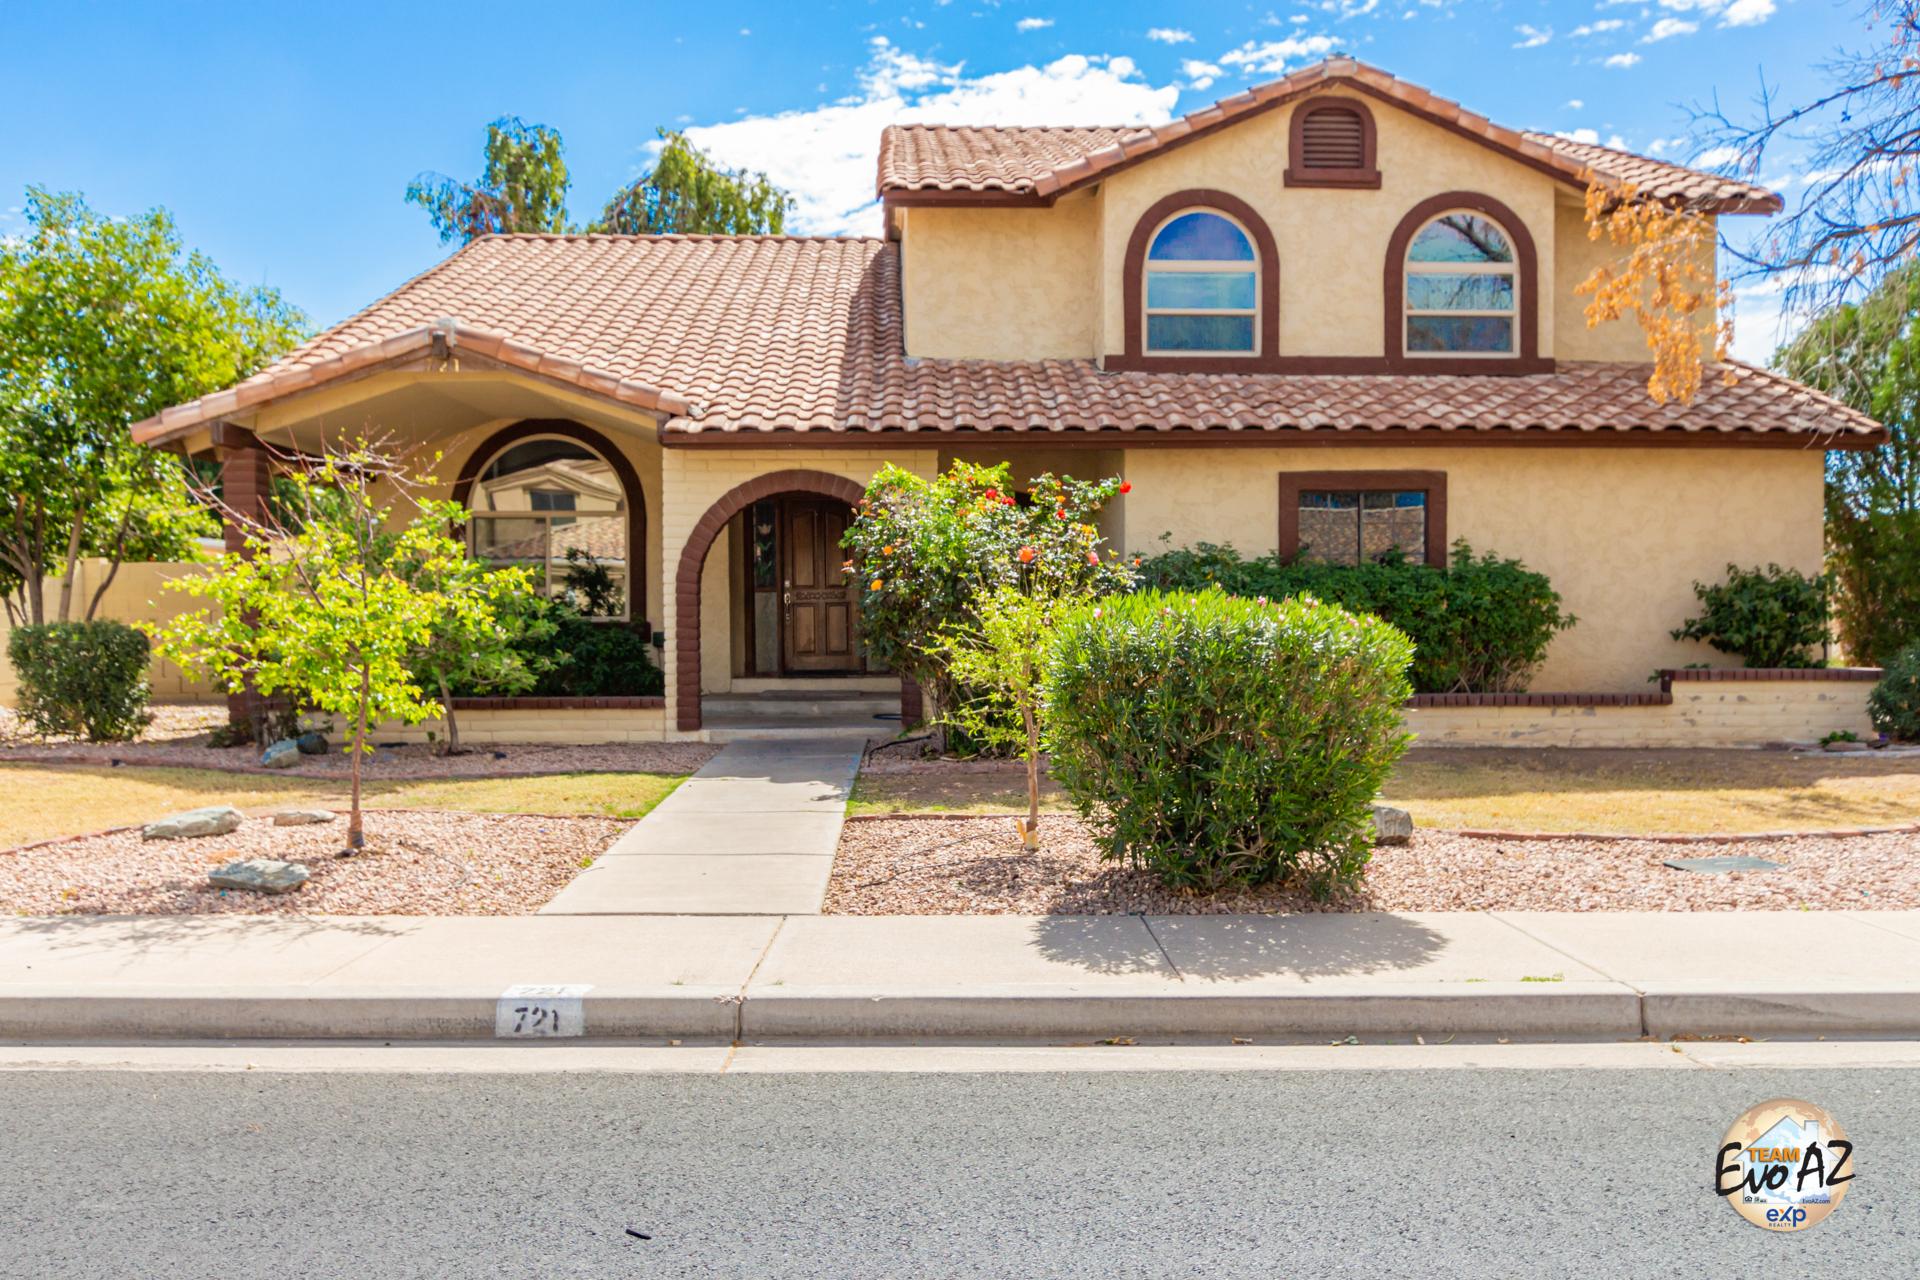 721 S GLENVIEW --, Mesa, AZ 85204